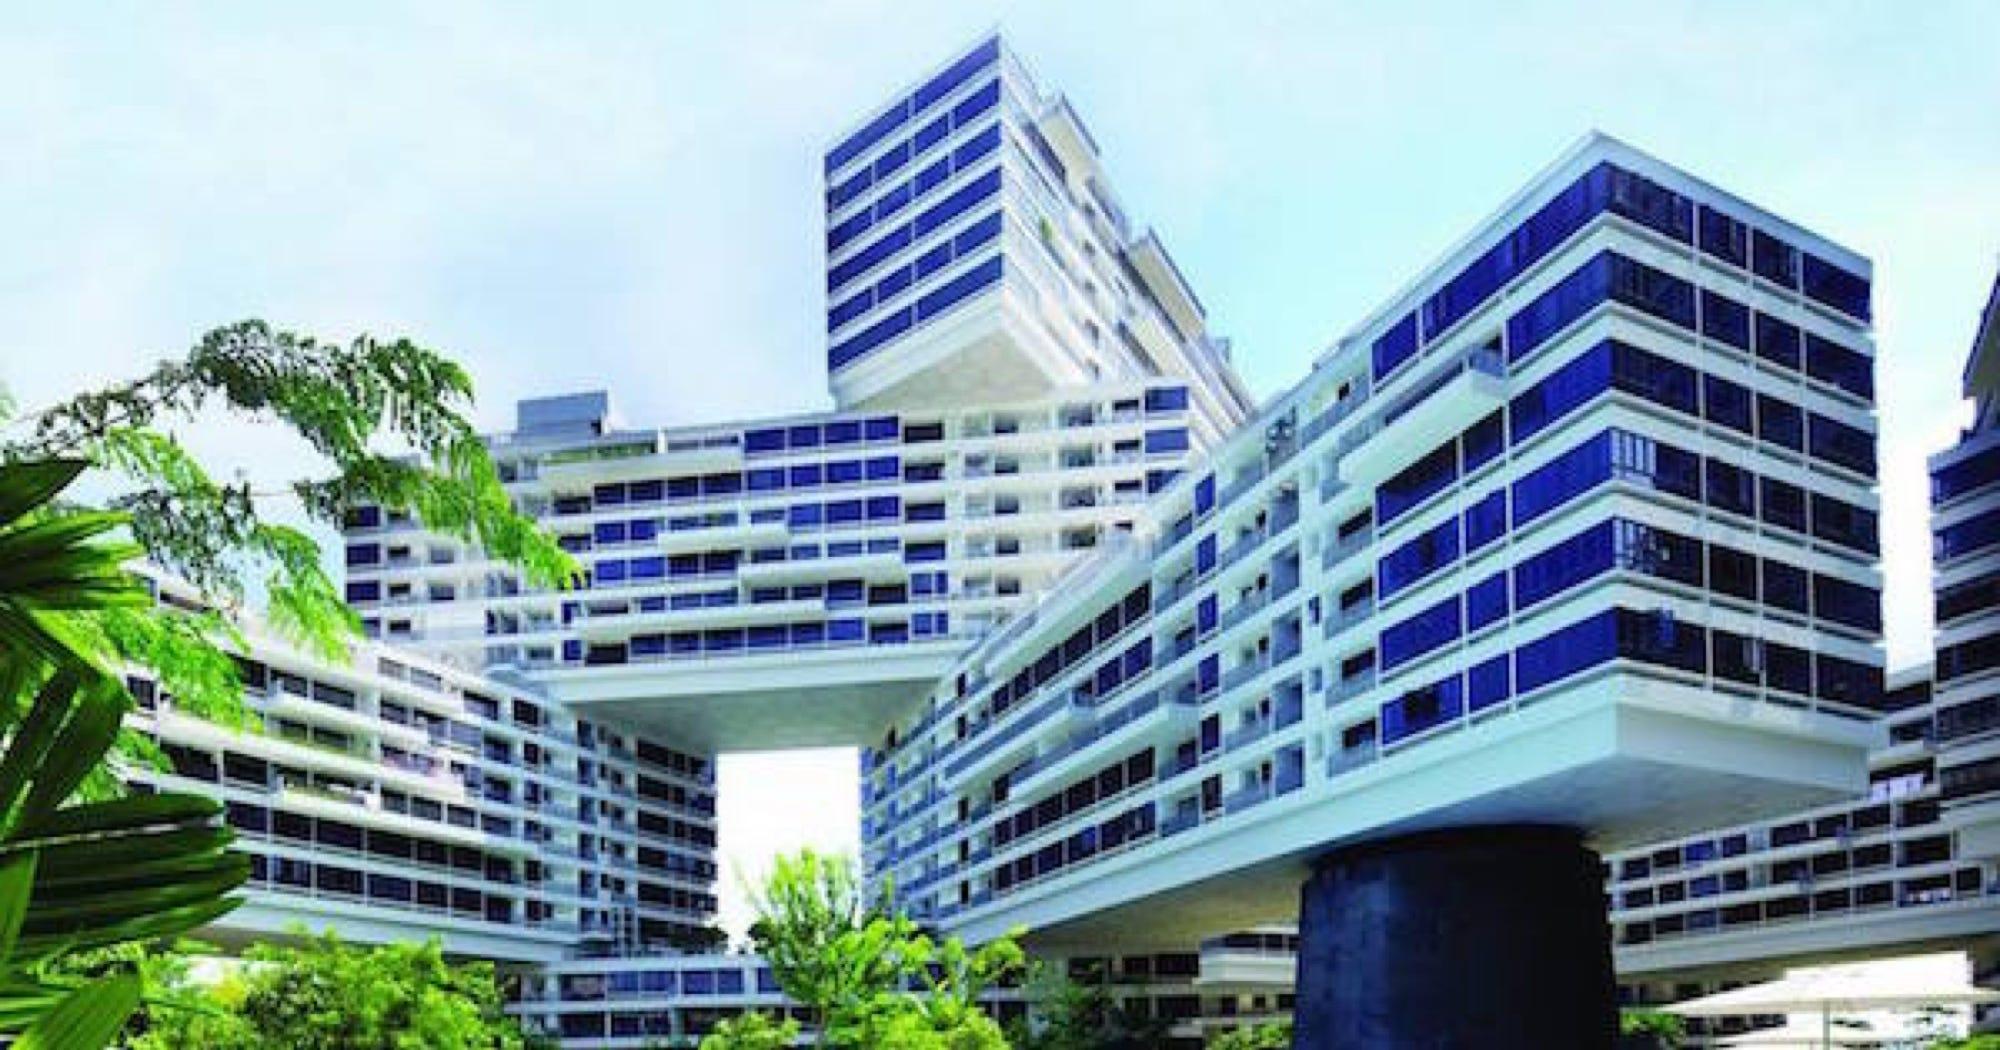 singapore interlace apartment complex top building